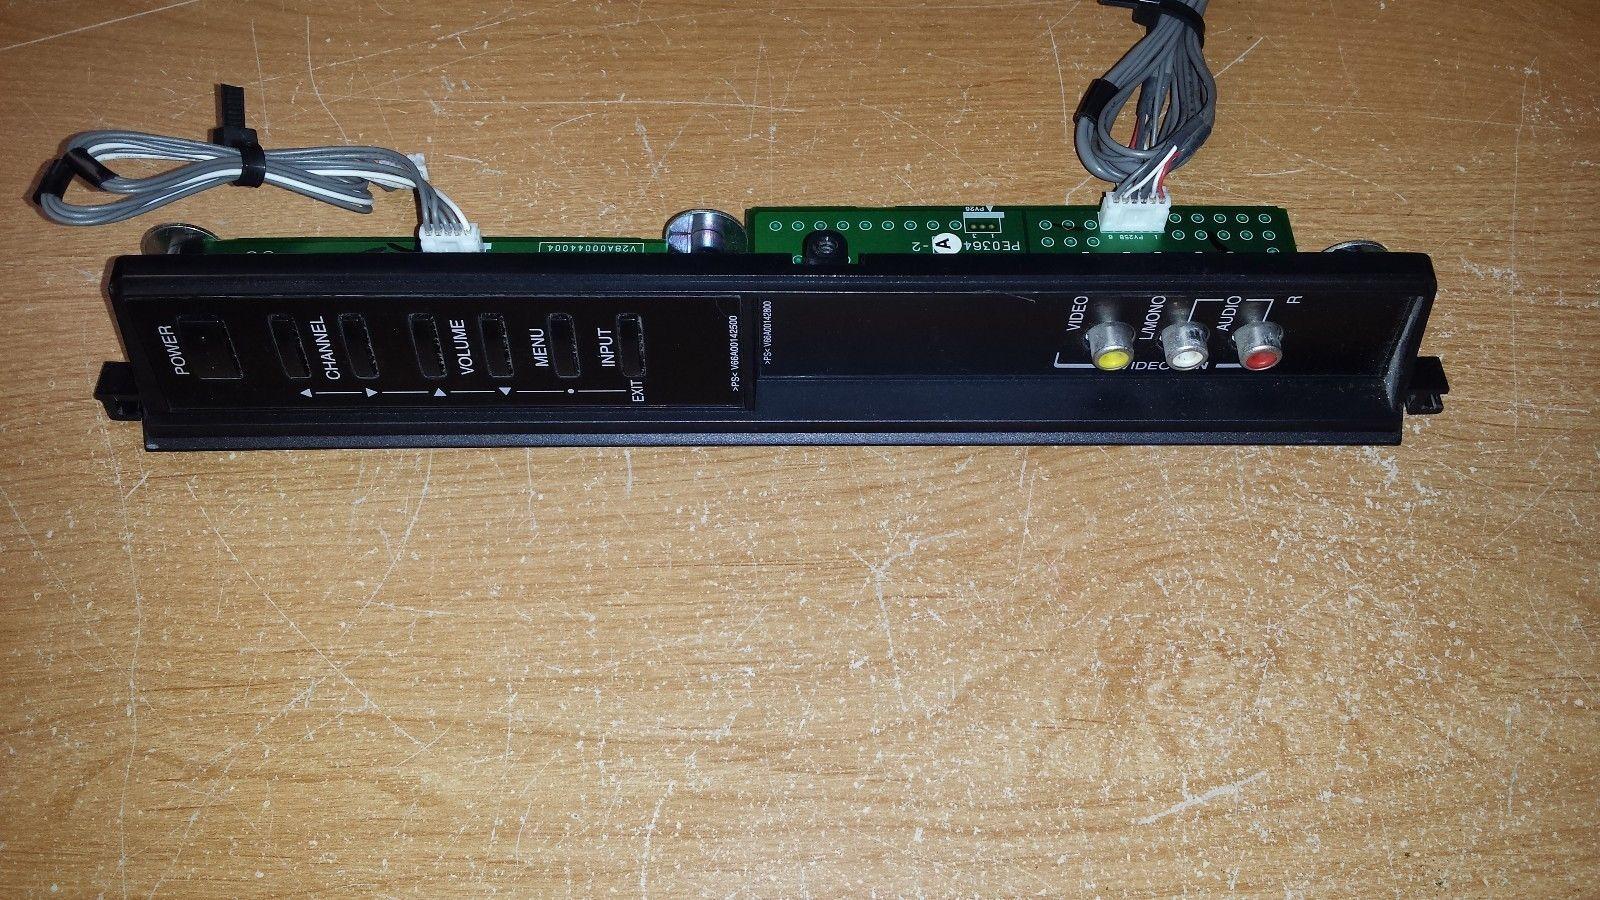 Toshiba 46LX177 - Key Controller & AV Board (PE0364A-2 & PE0364A-4)